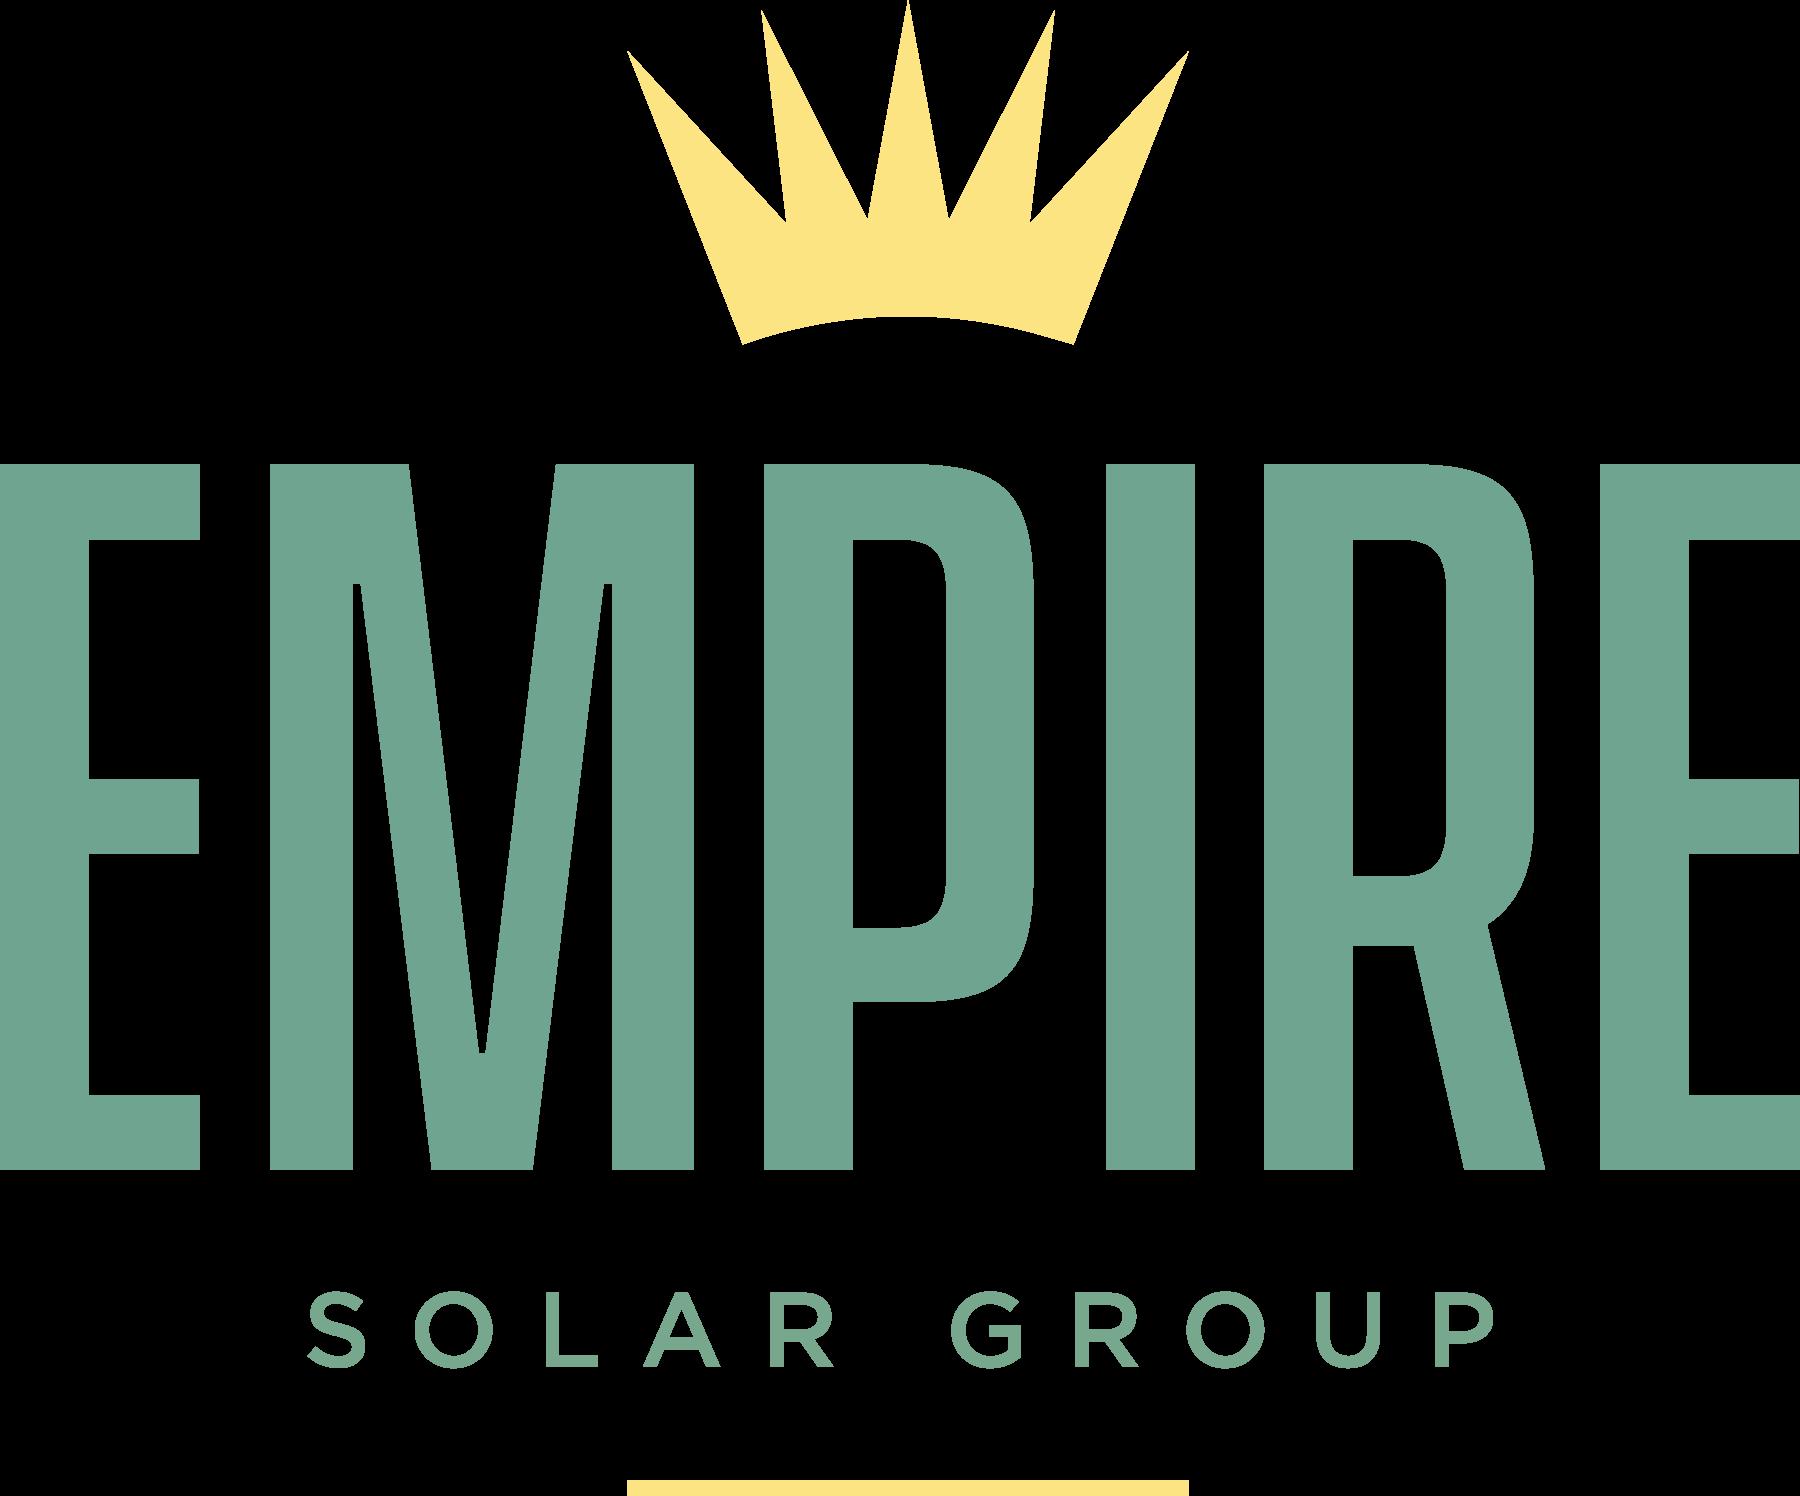 Vivint solar reviews california - Empire Solar Group Llc No Reviews